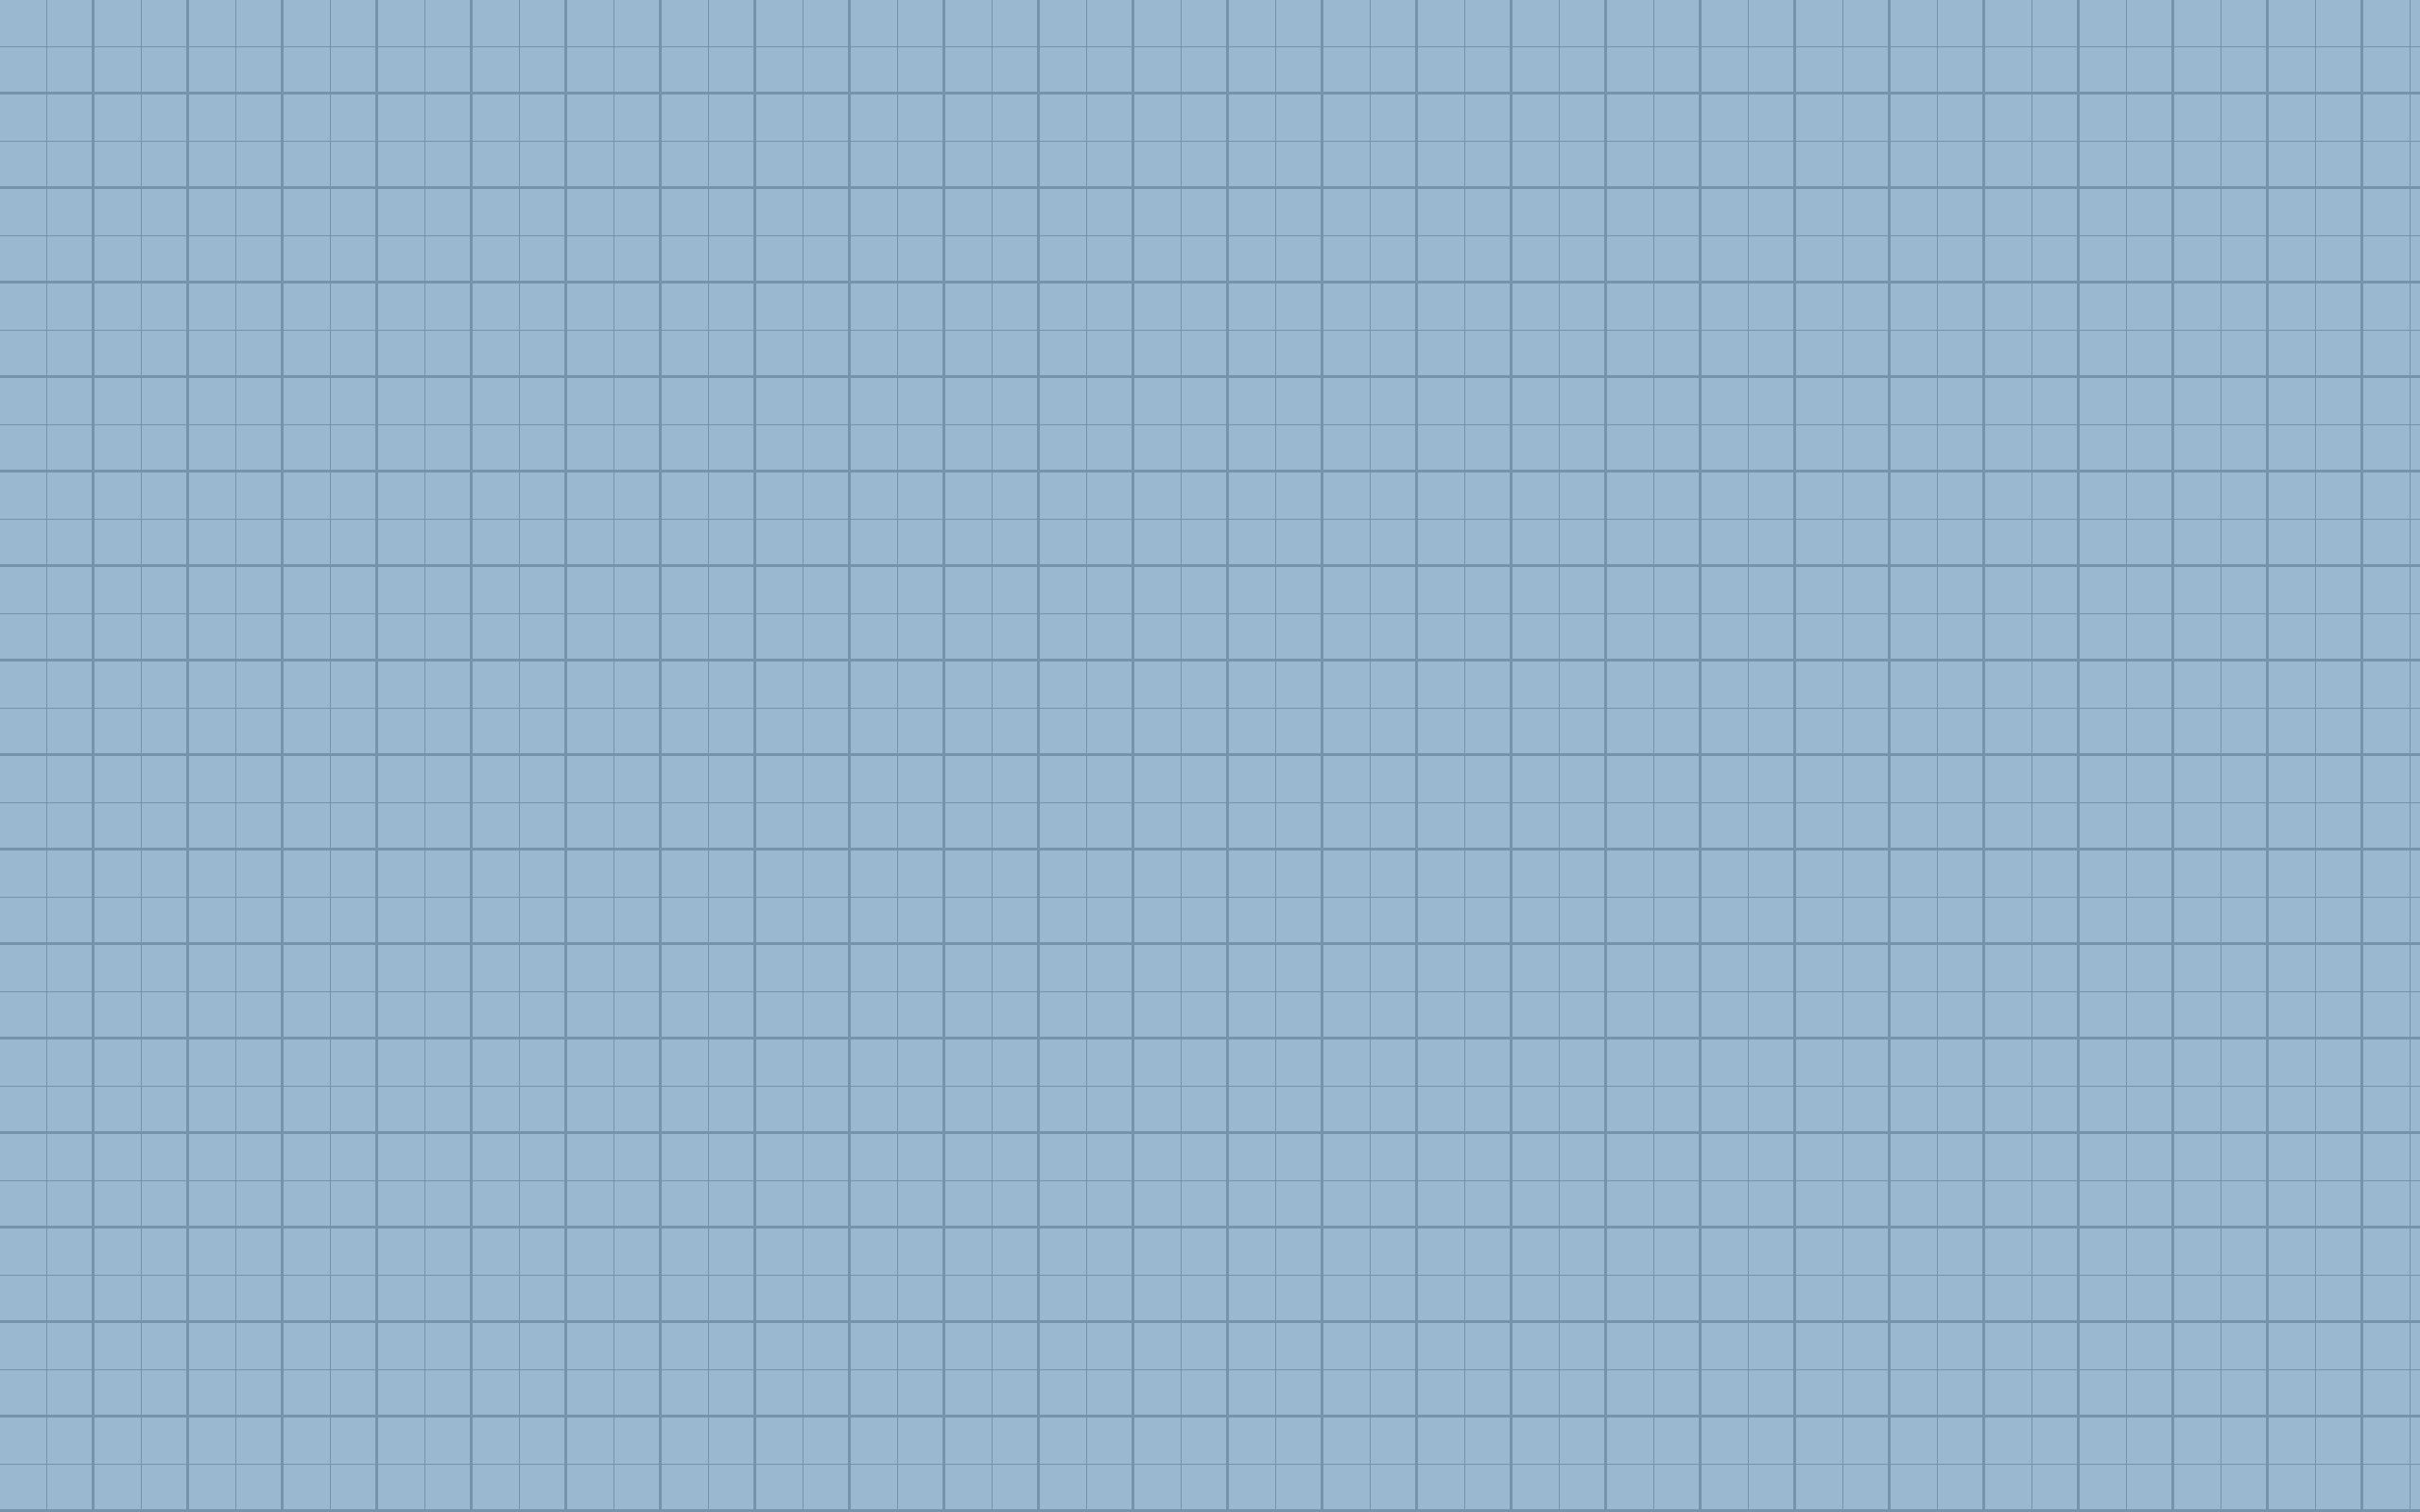 Aesthetic Grid Laptop Wallpapers   Top Aesthetic Grid Laptop 2560x1600